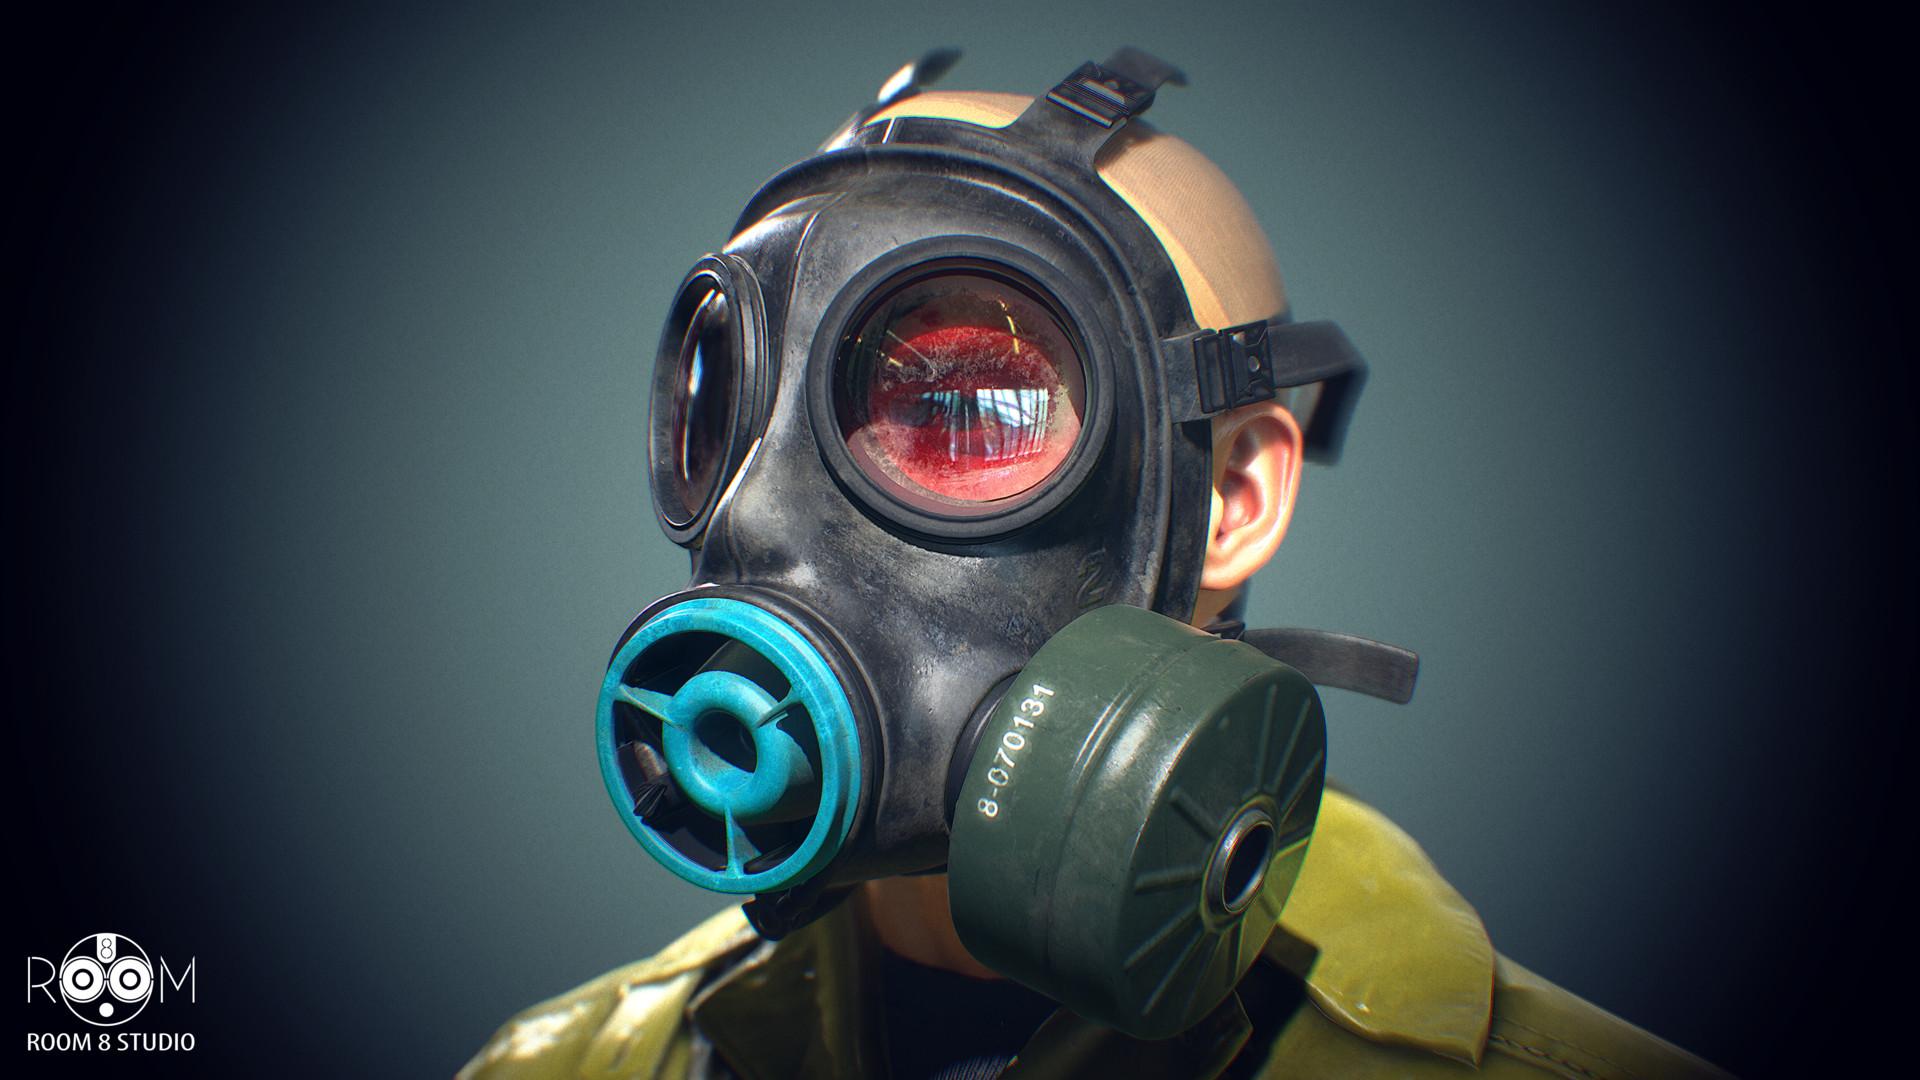 Room 8 studio gasmask 02